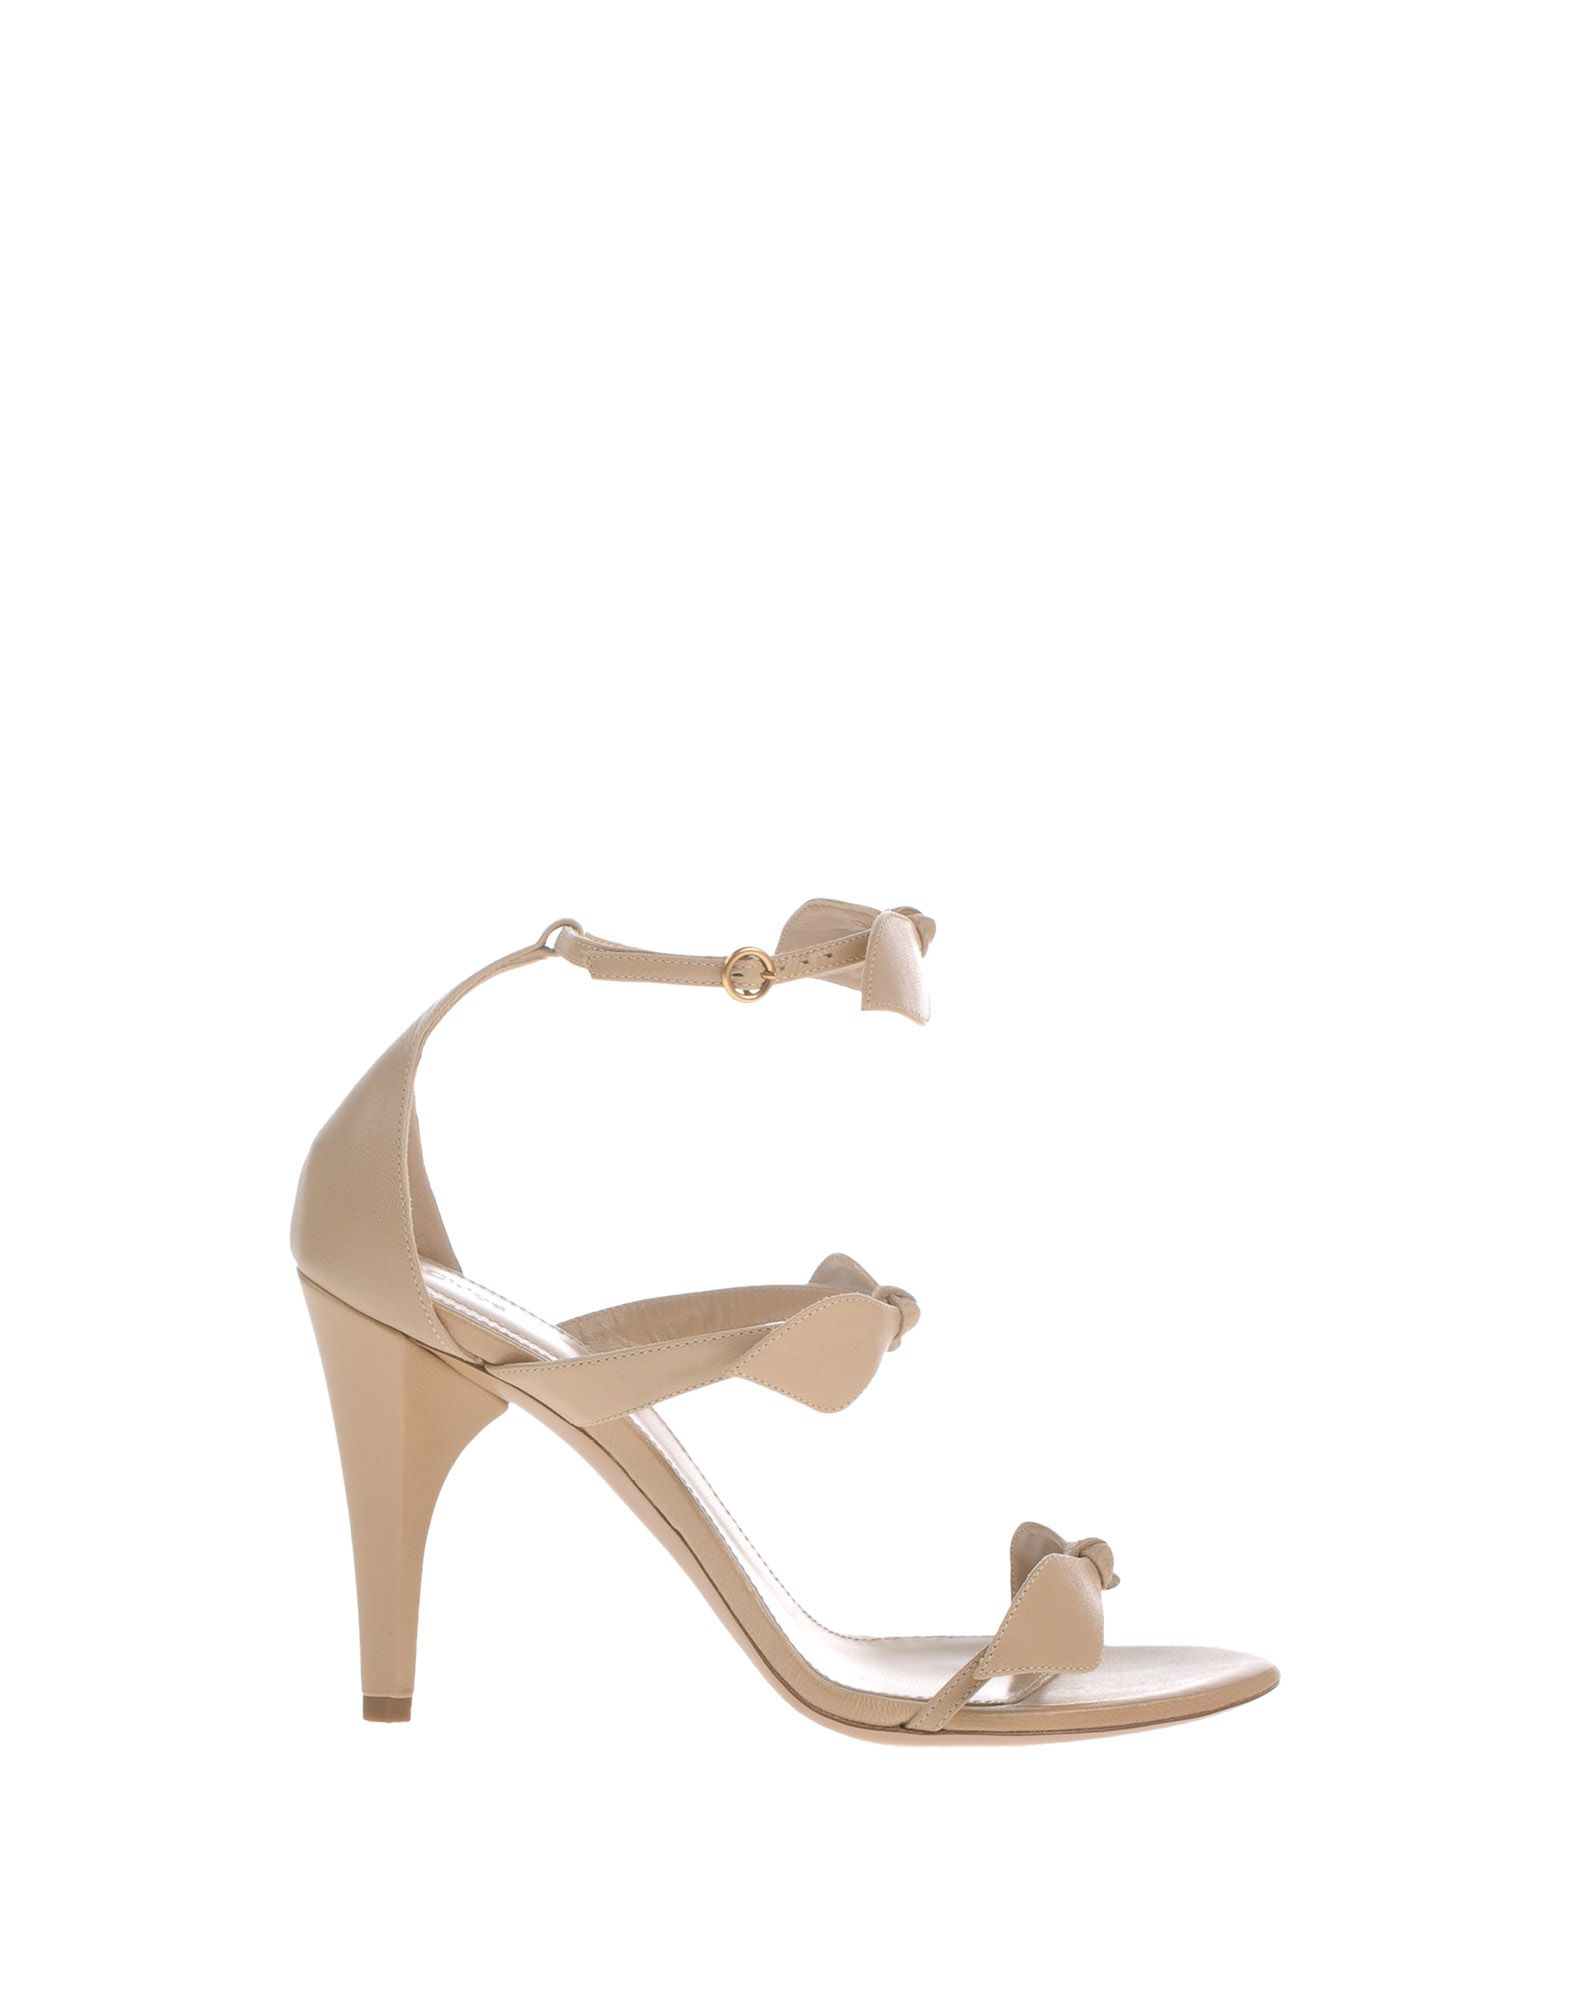 Chloé Sandalen Damen  aussehende 11362995HHGünstige gut aussehende  Schuhe 9f2e05